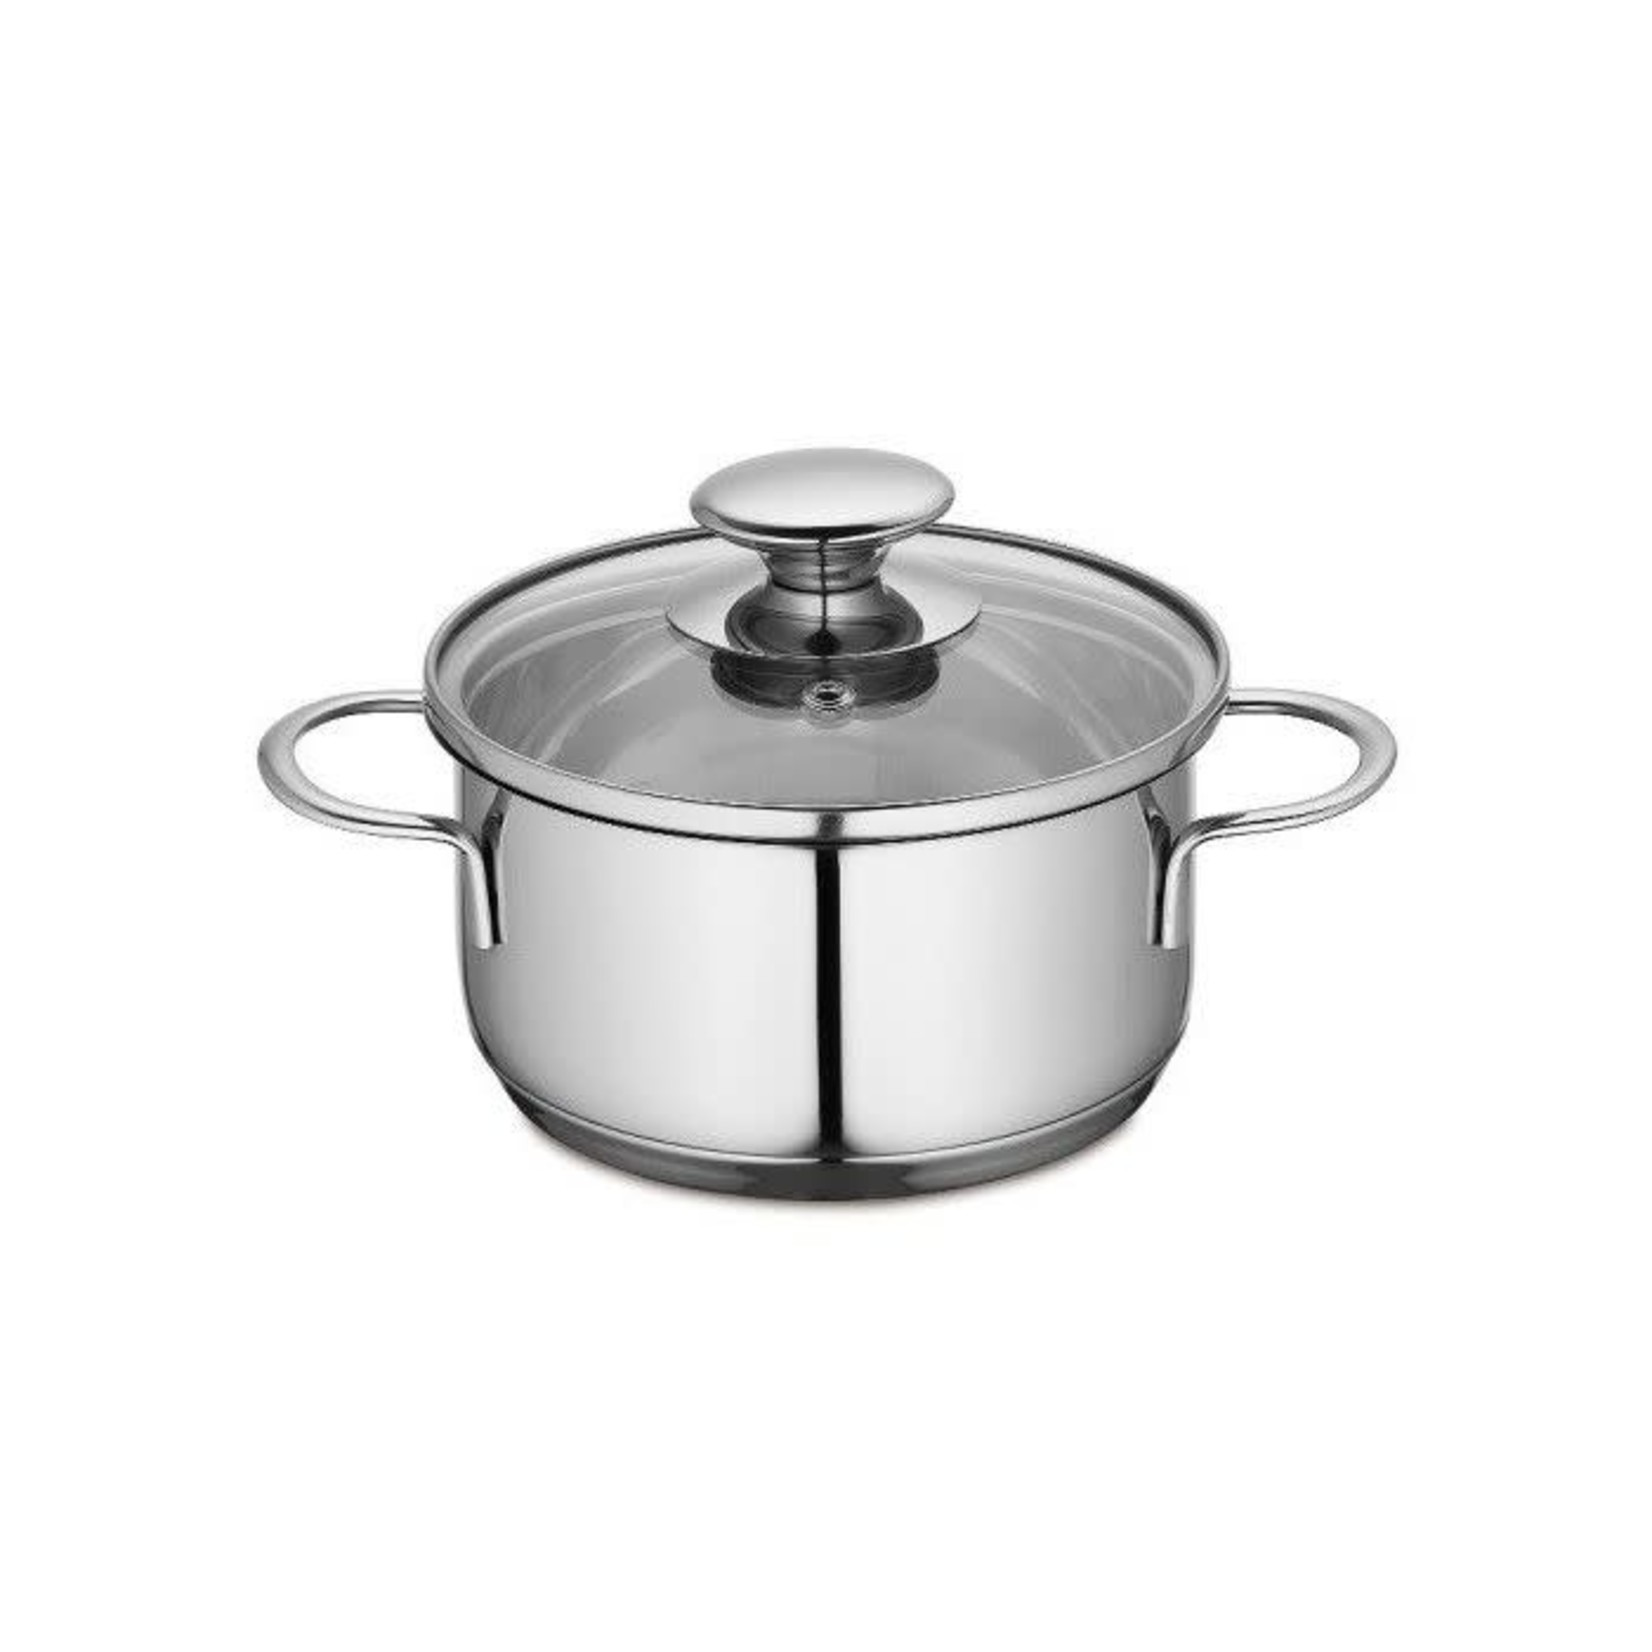 Küchenprofi Mini-kookpannetje 14cm